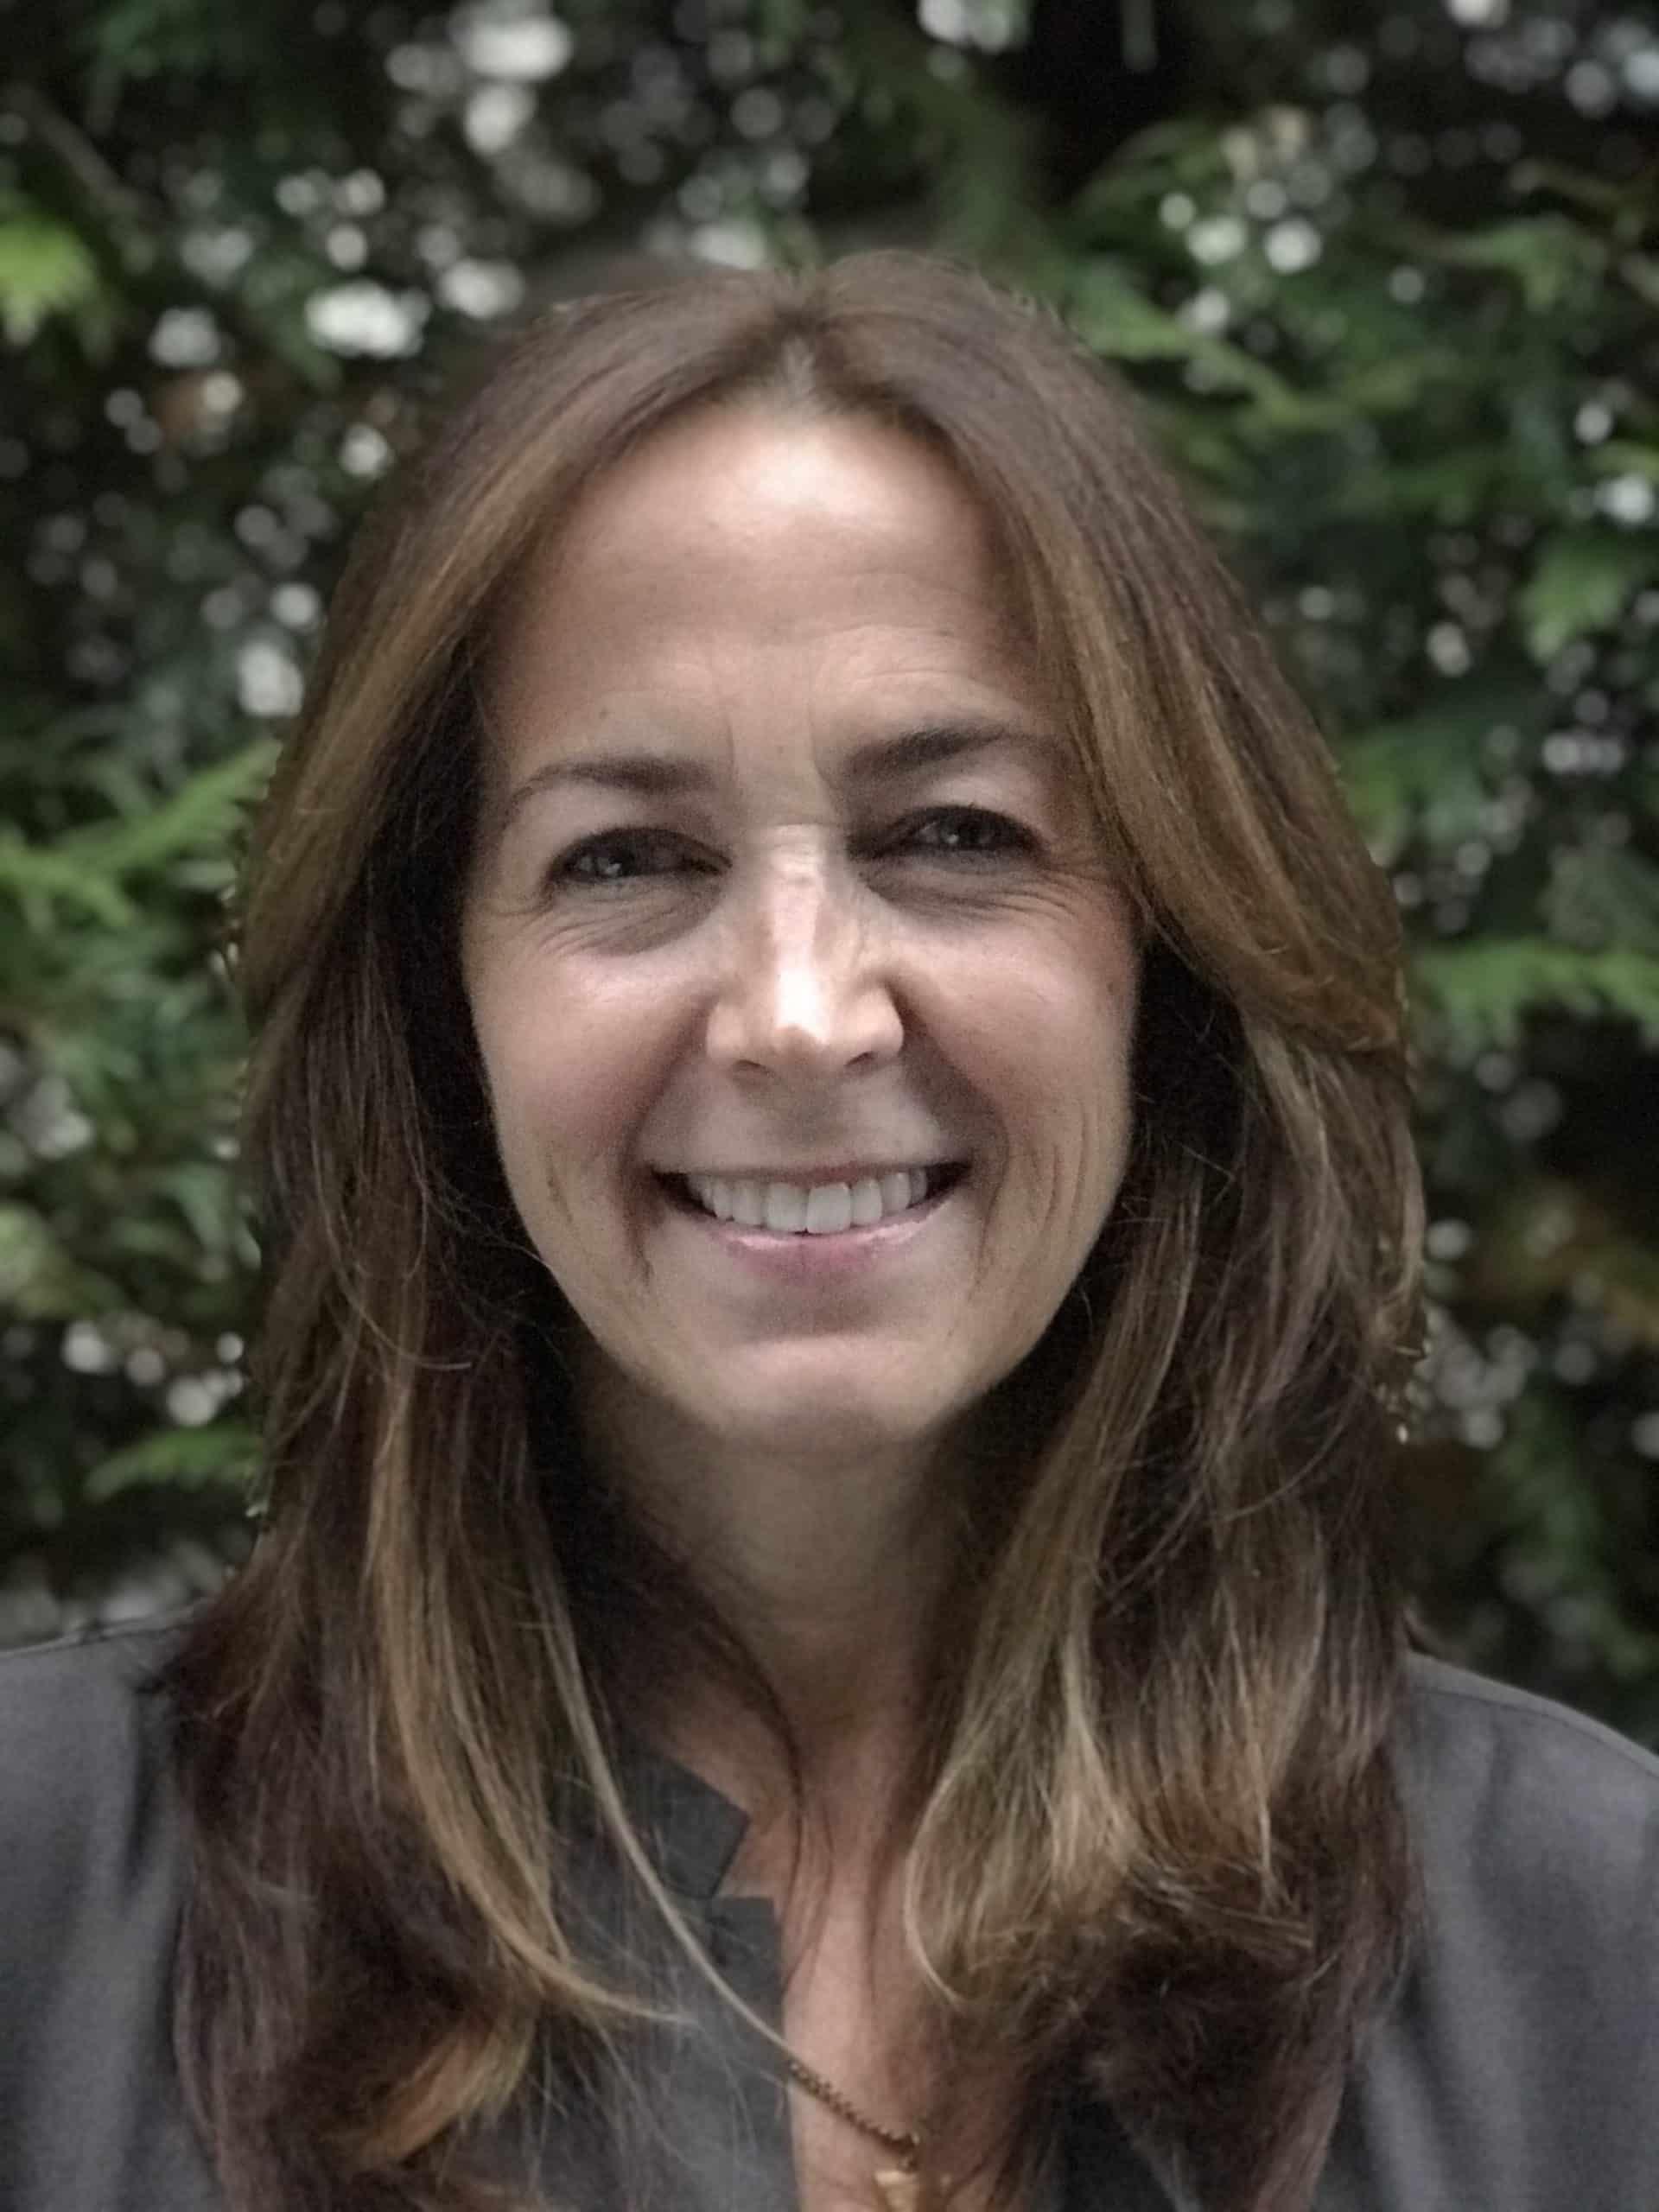 Interview of the Week - Linda Crosnier - Blog